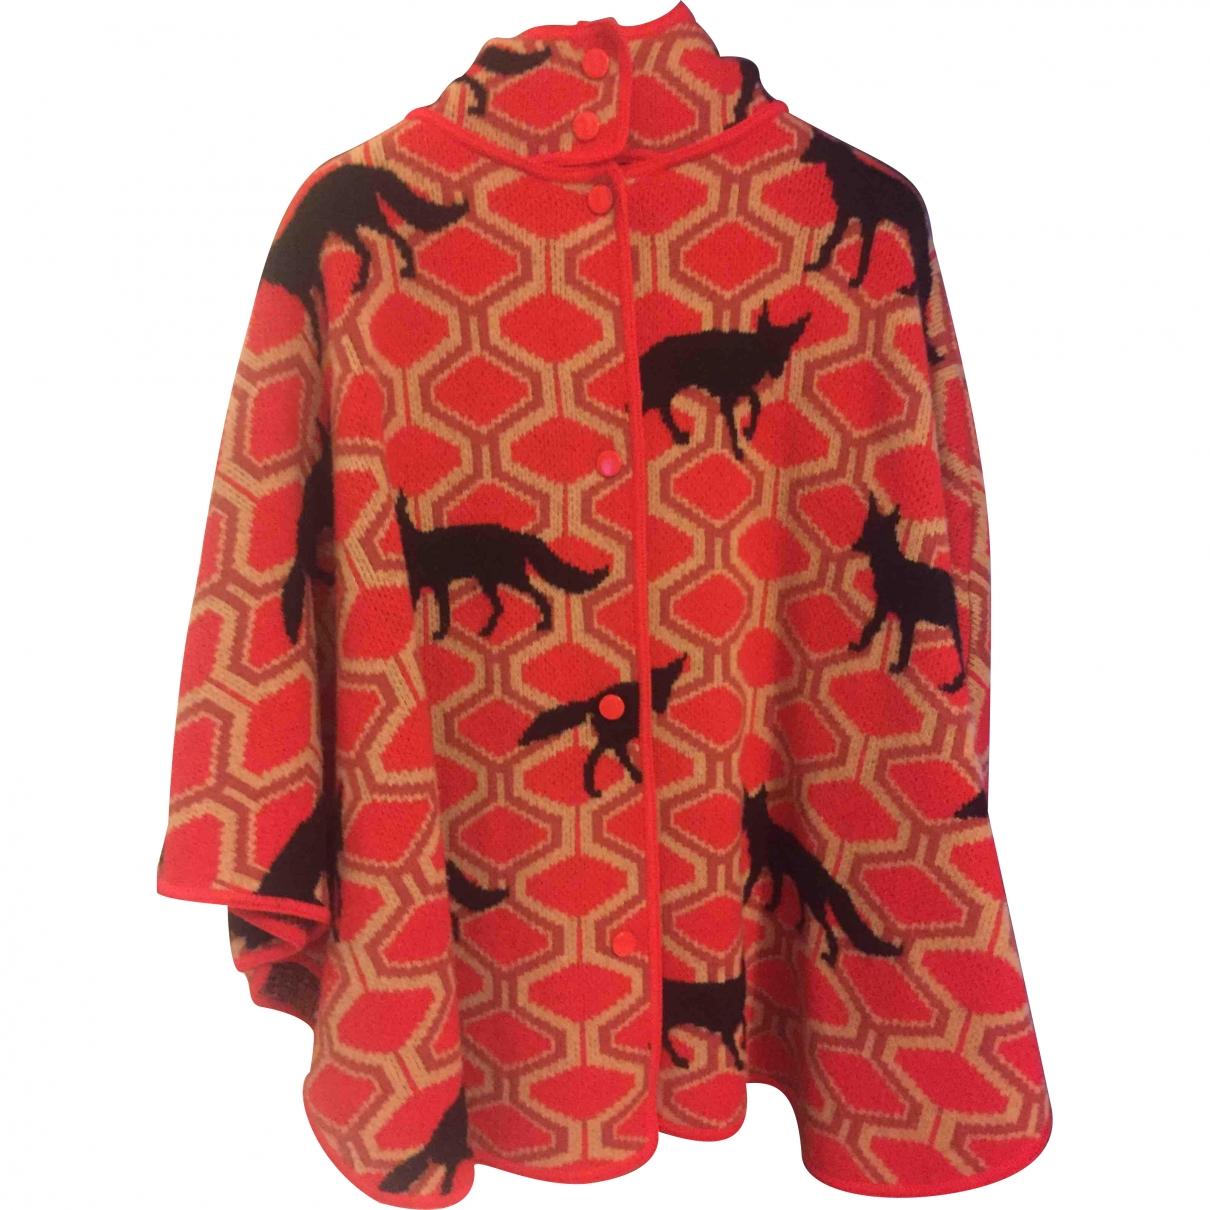 M Missoni \N Red Wool jacket for Women S